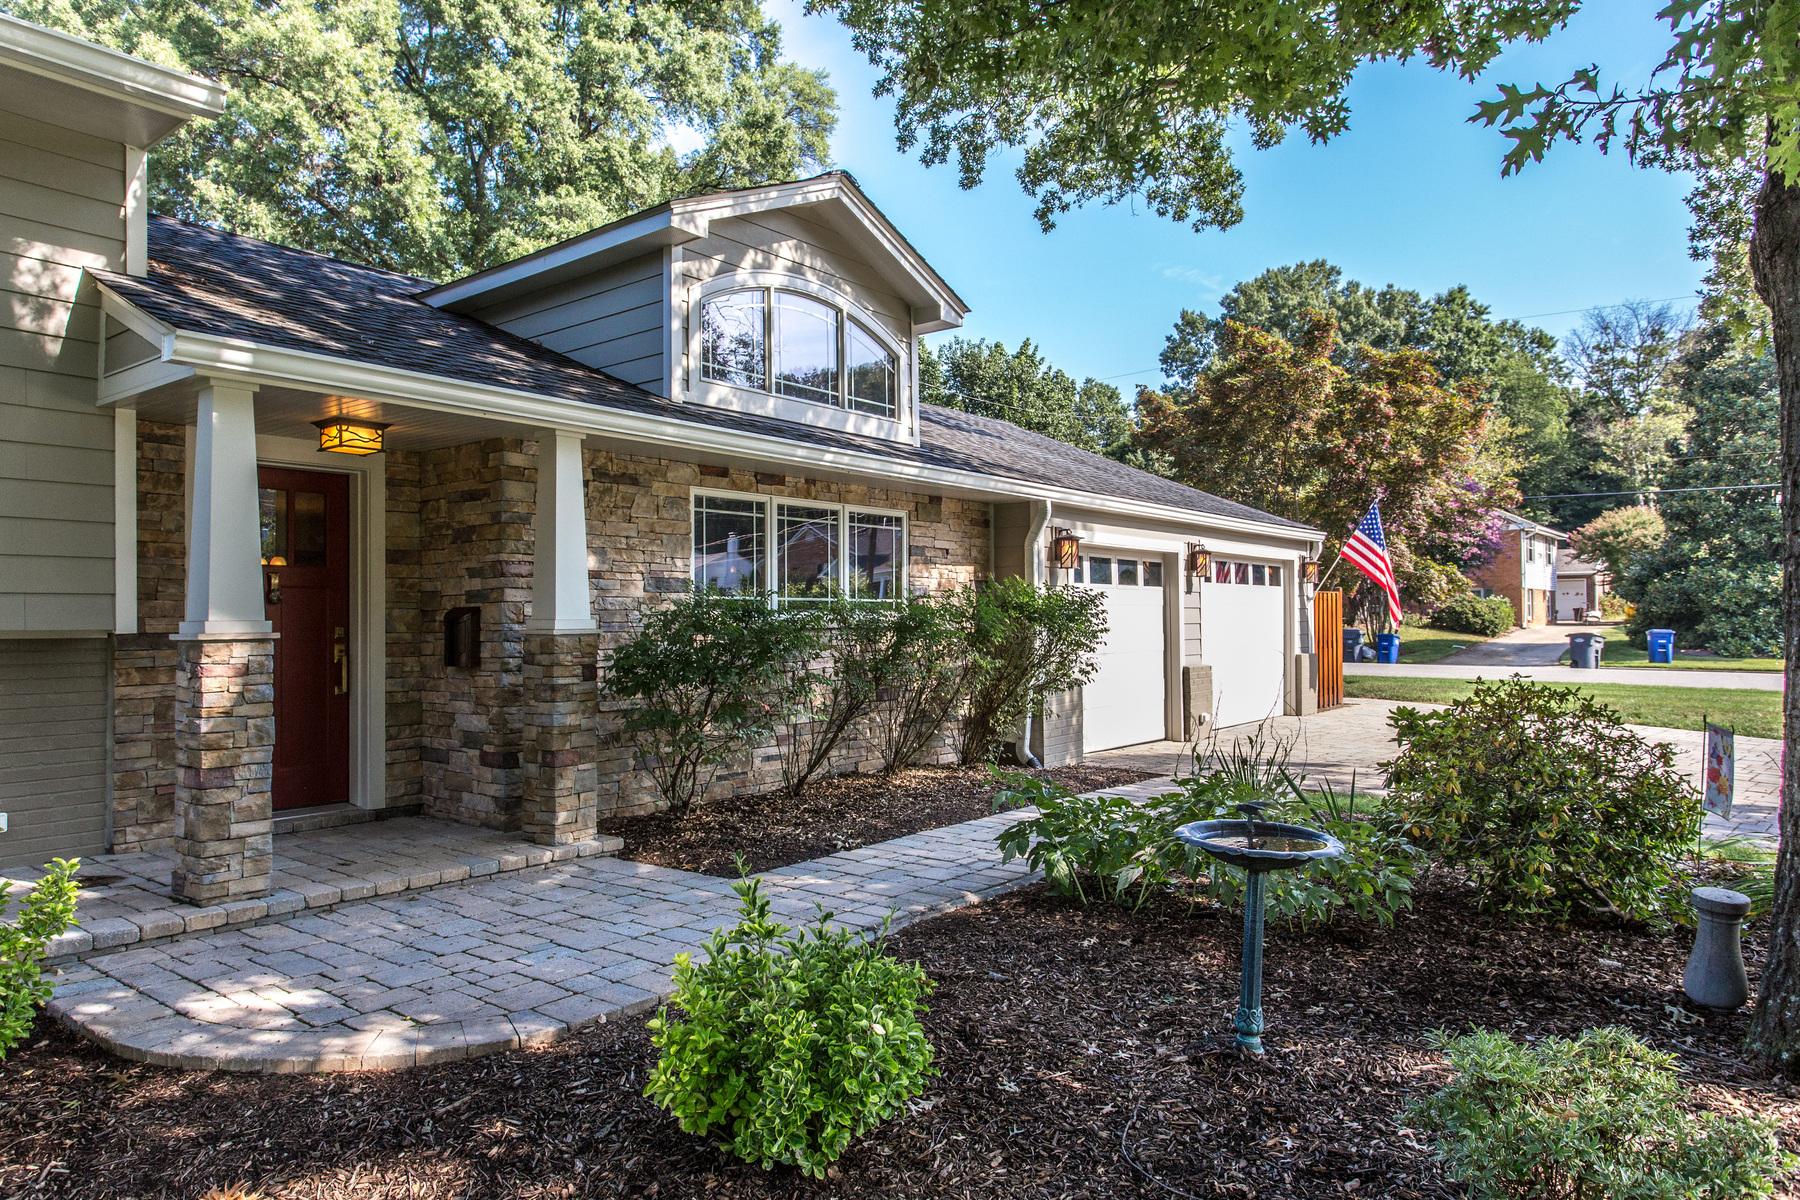 Single Family Home for Sale at 8402 Morey Lane, Alexandria 8402 Morey Ln Alexandria, Virginia 22308 United States